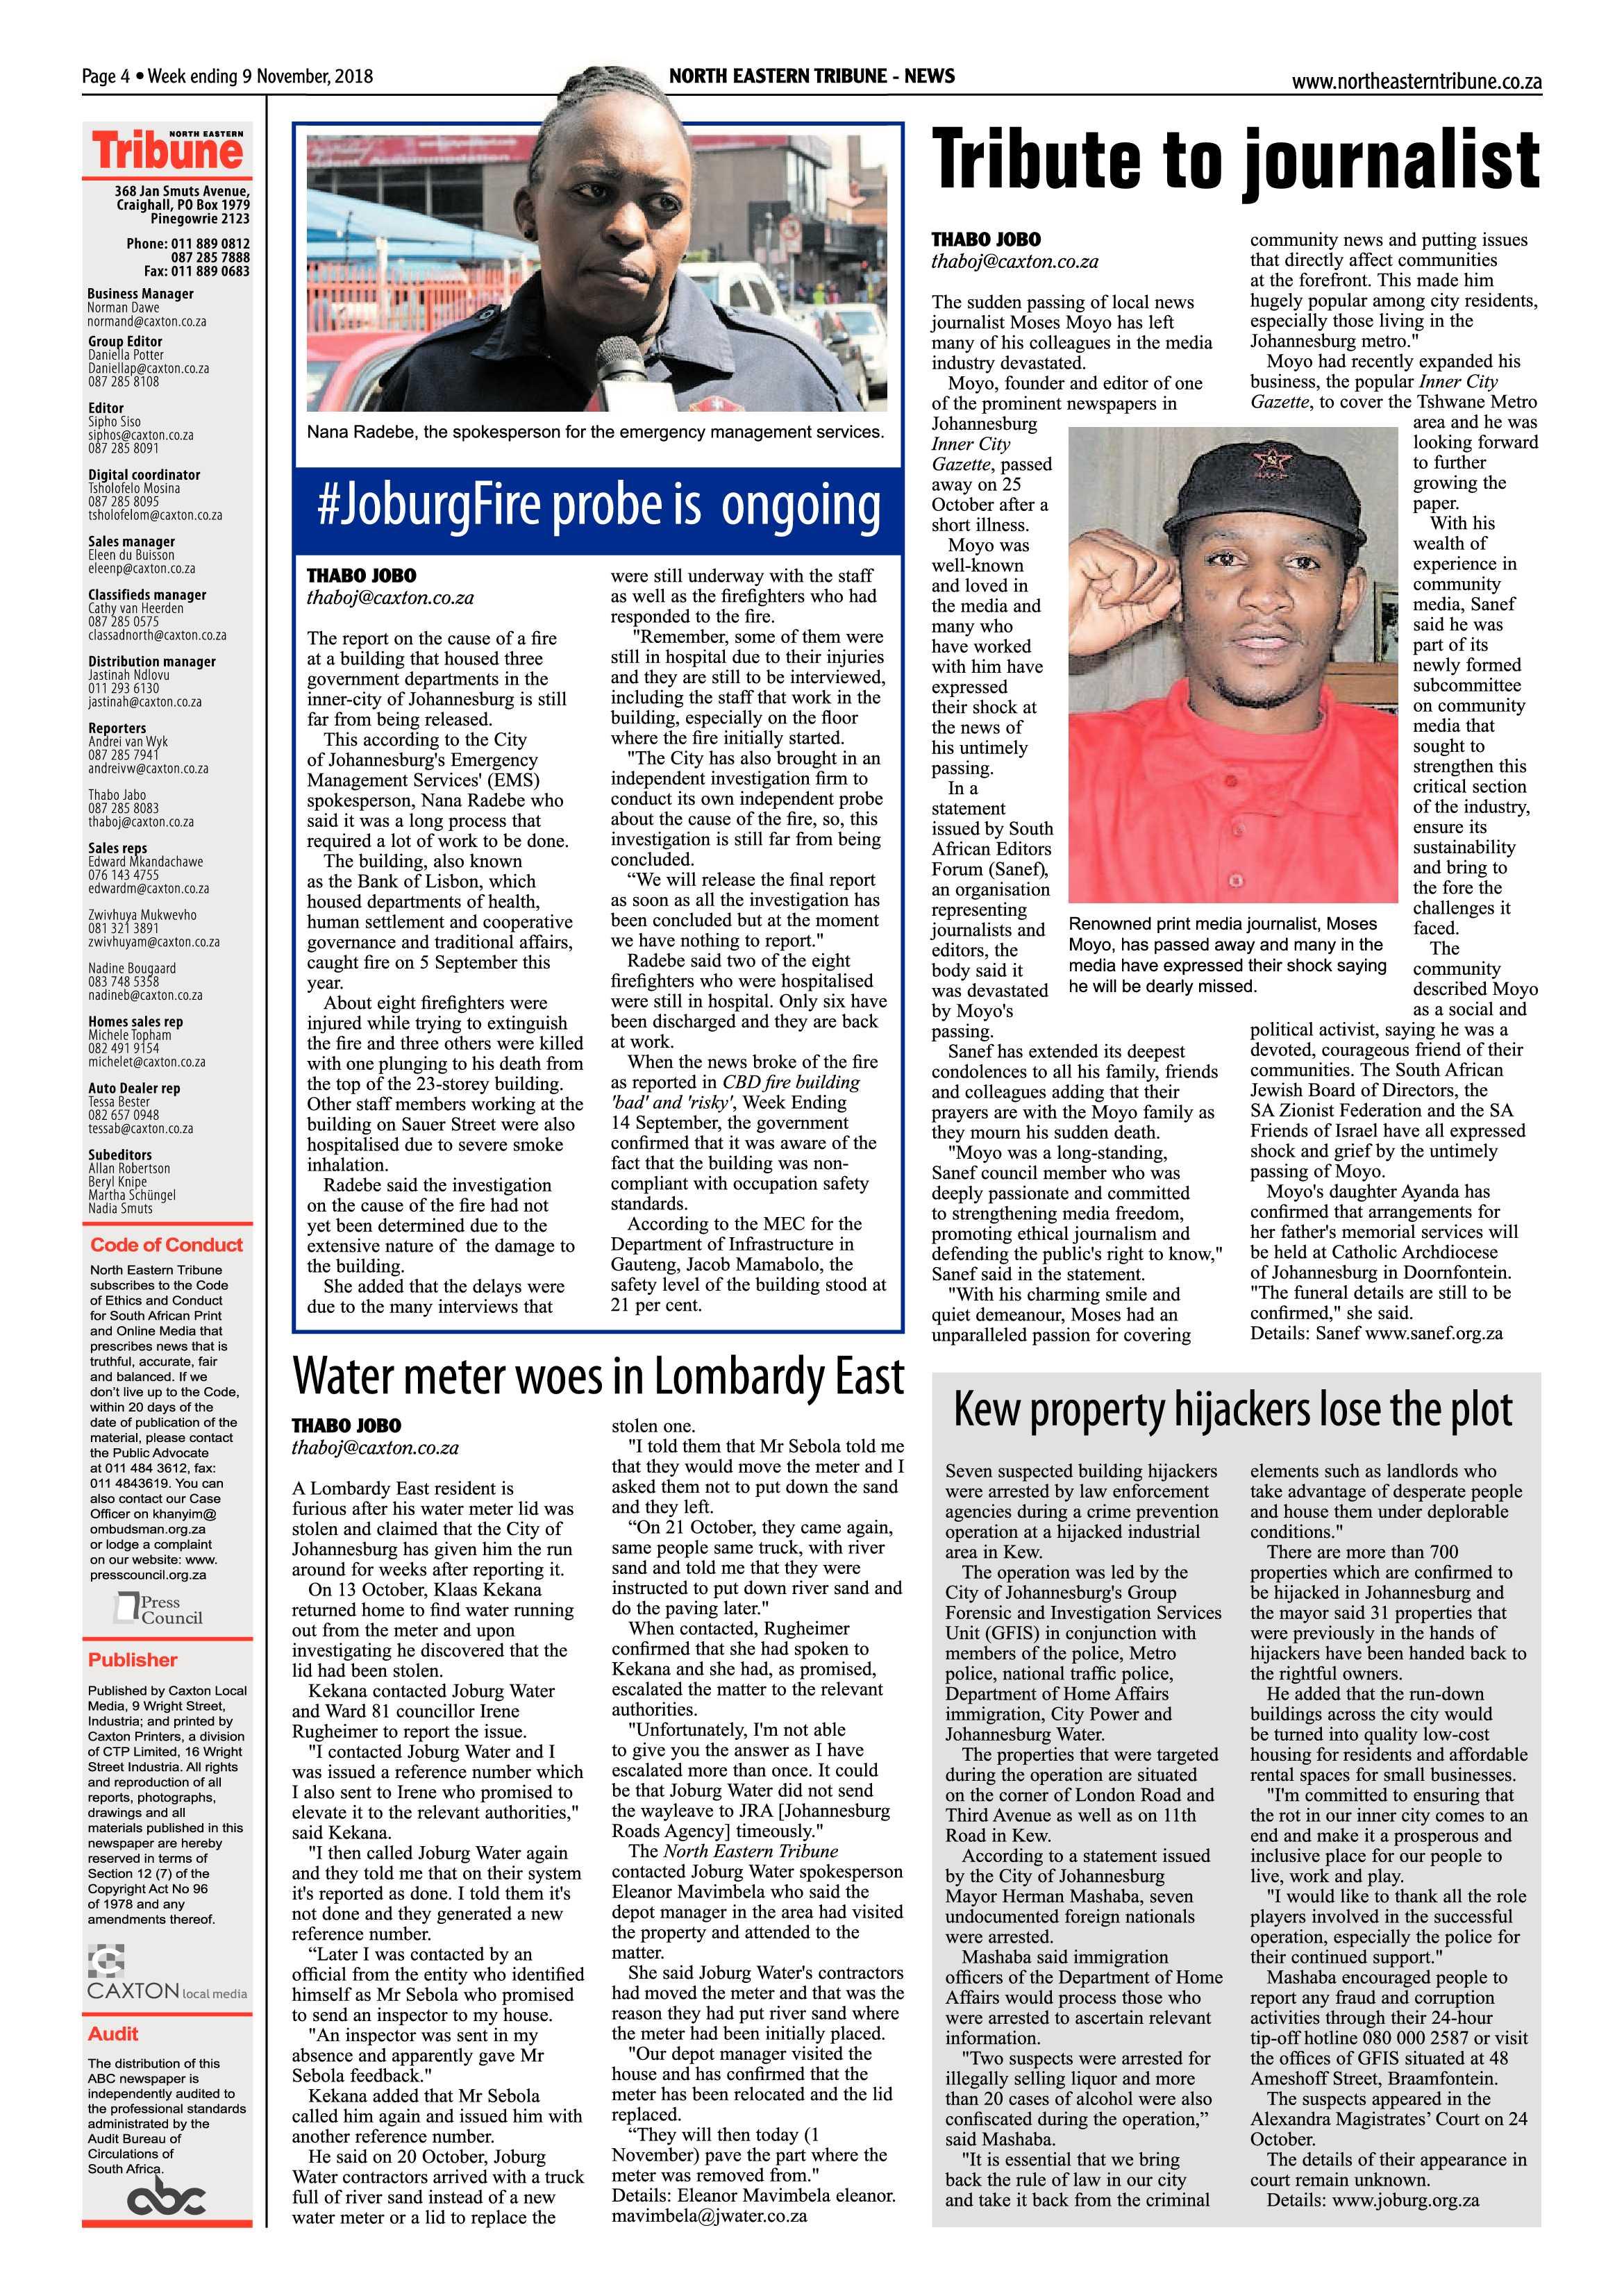 north-eastern-tribune-9-november-2018-epapers-page-4